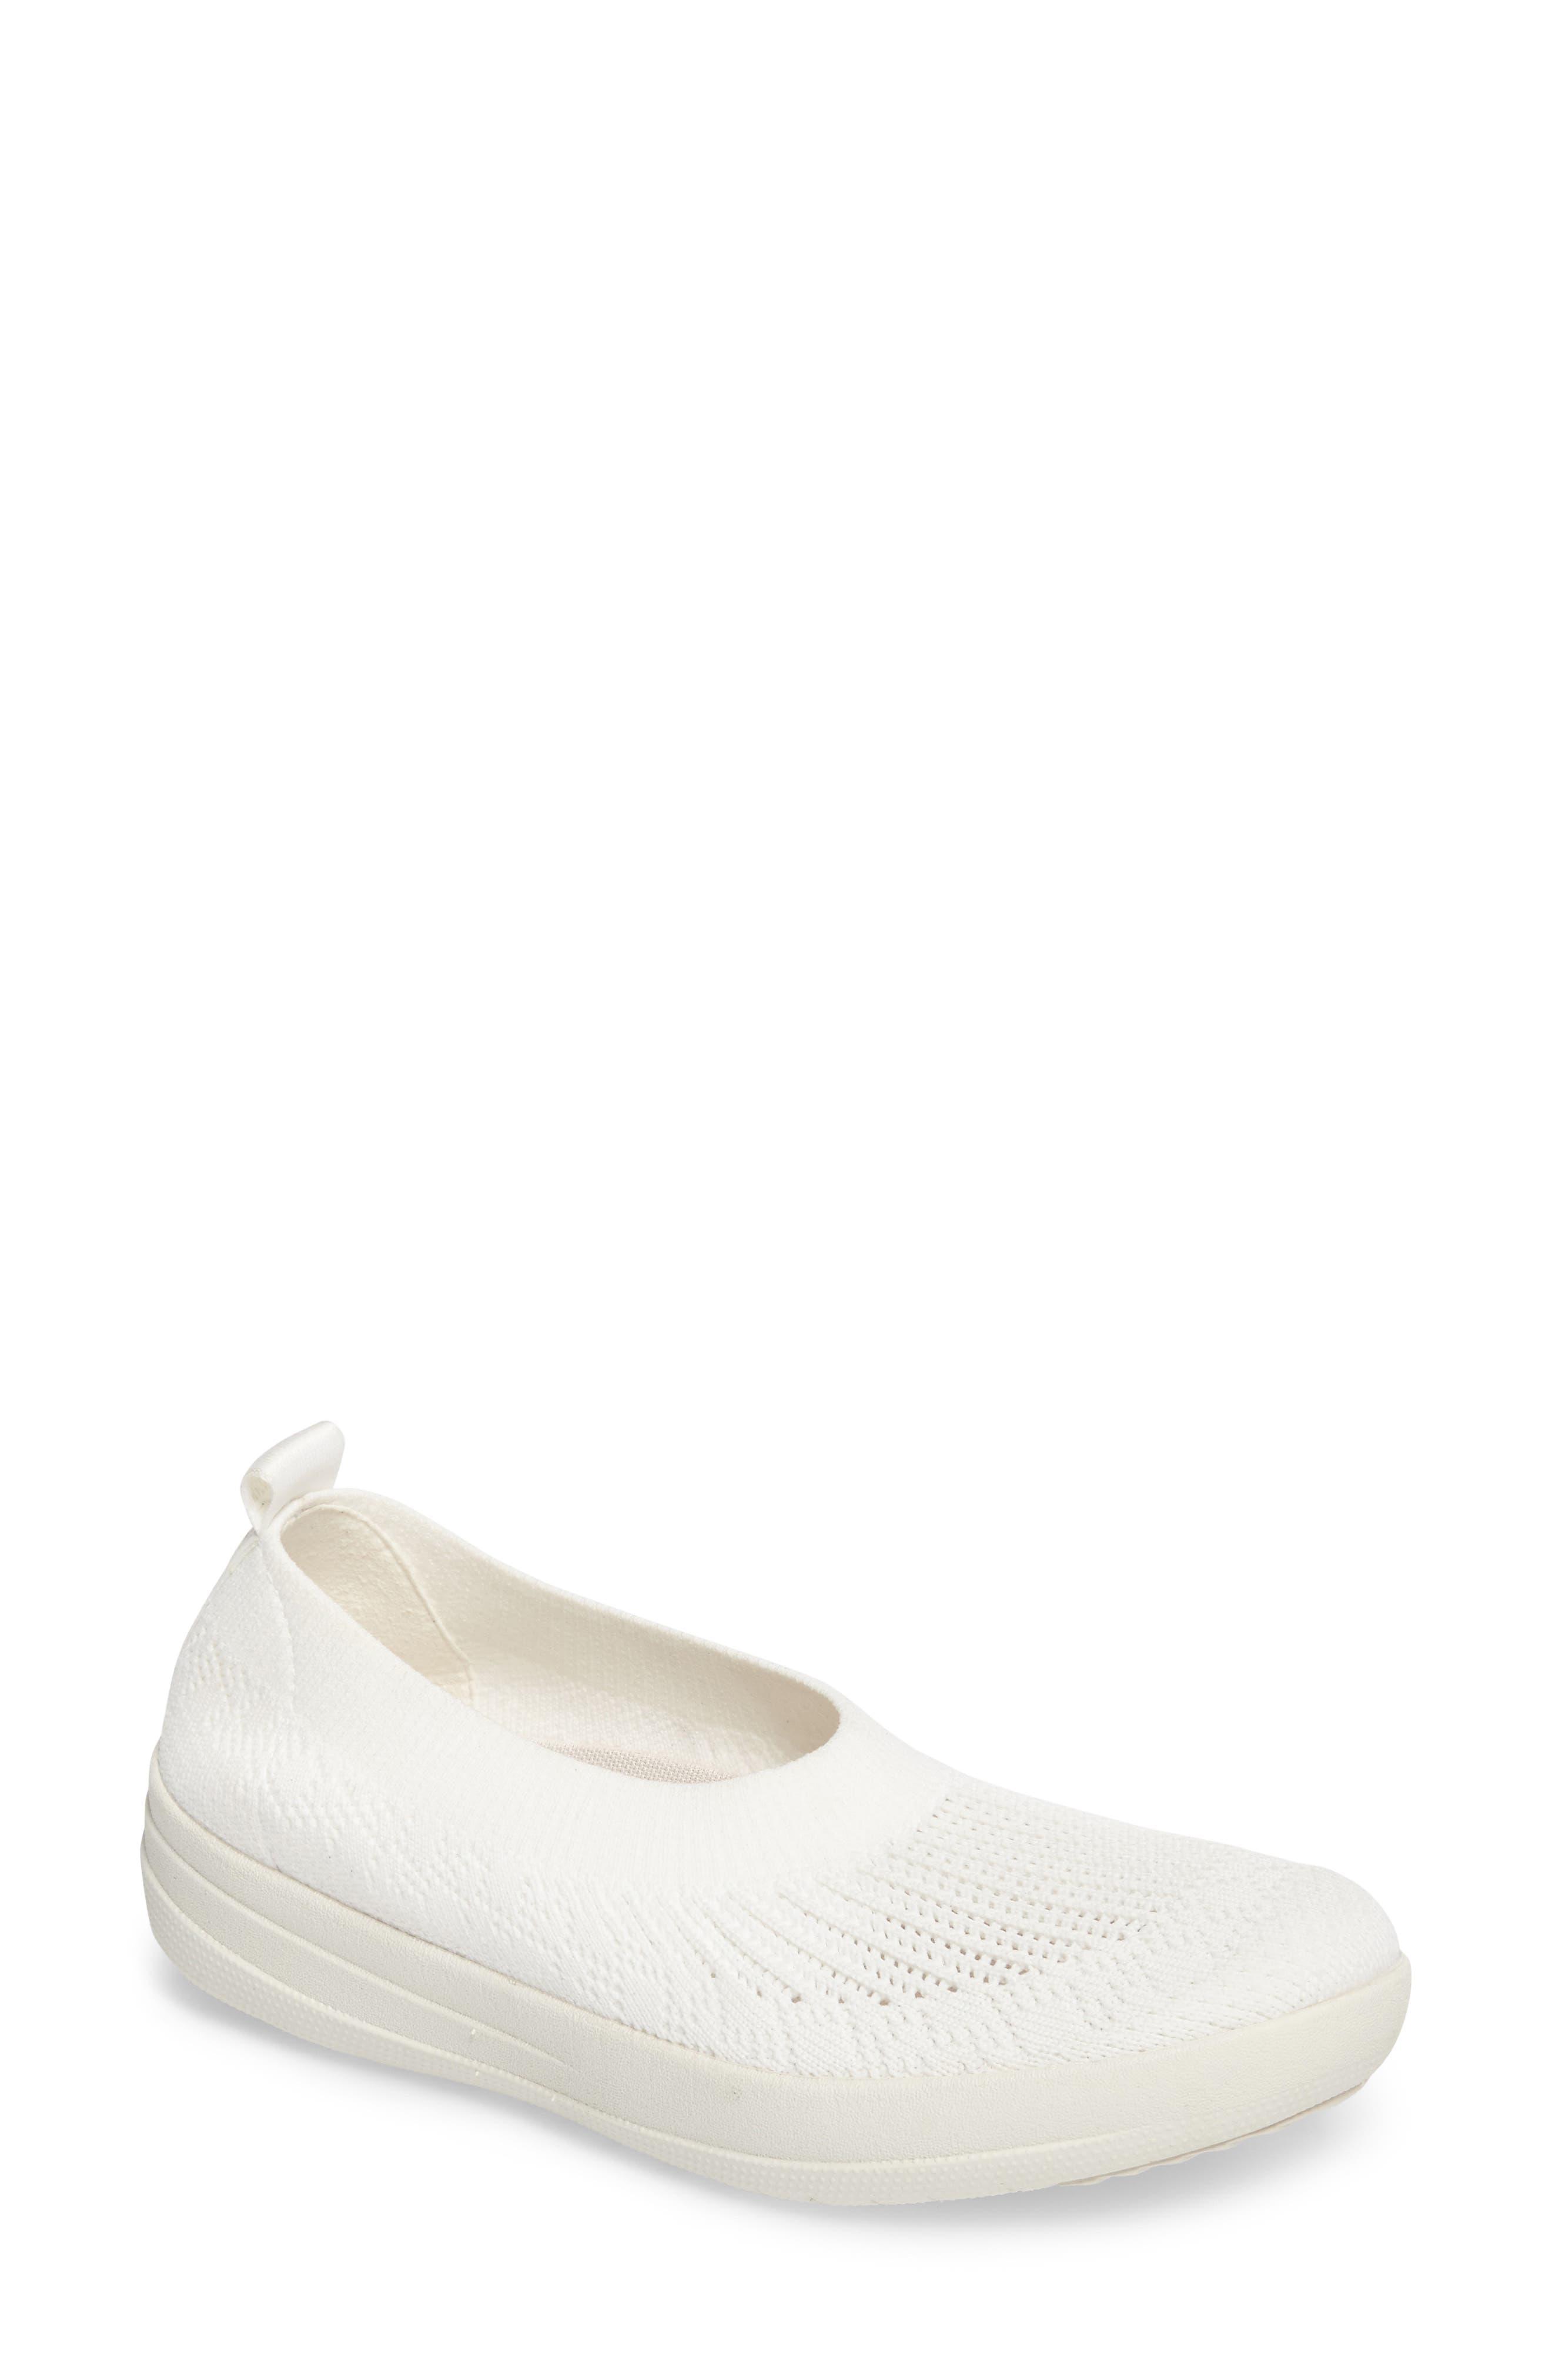 Uberknit Slip-On Sneaker,                         Main,                         color,